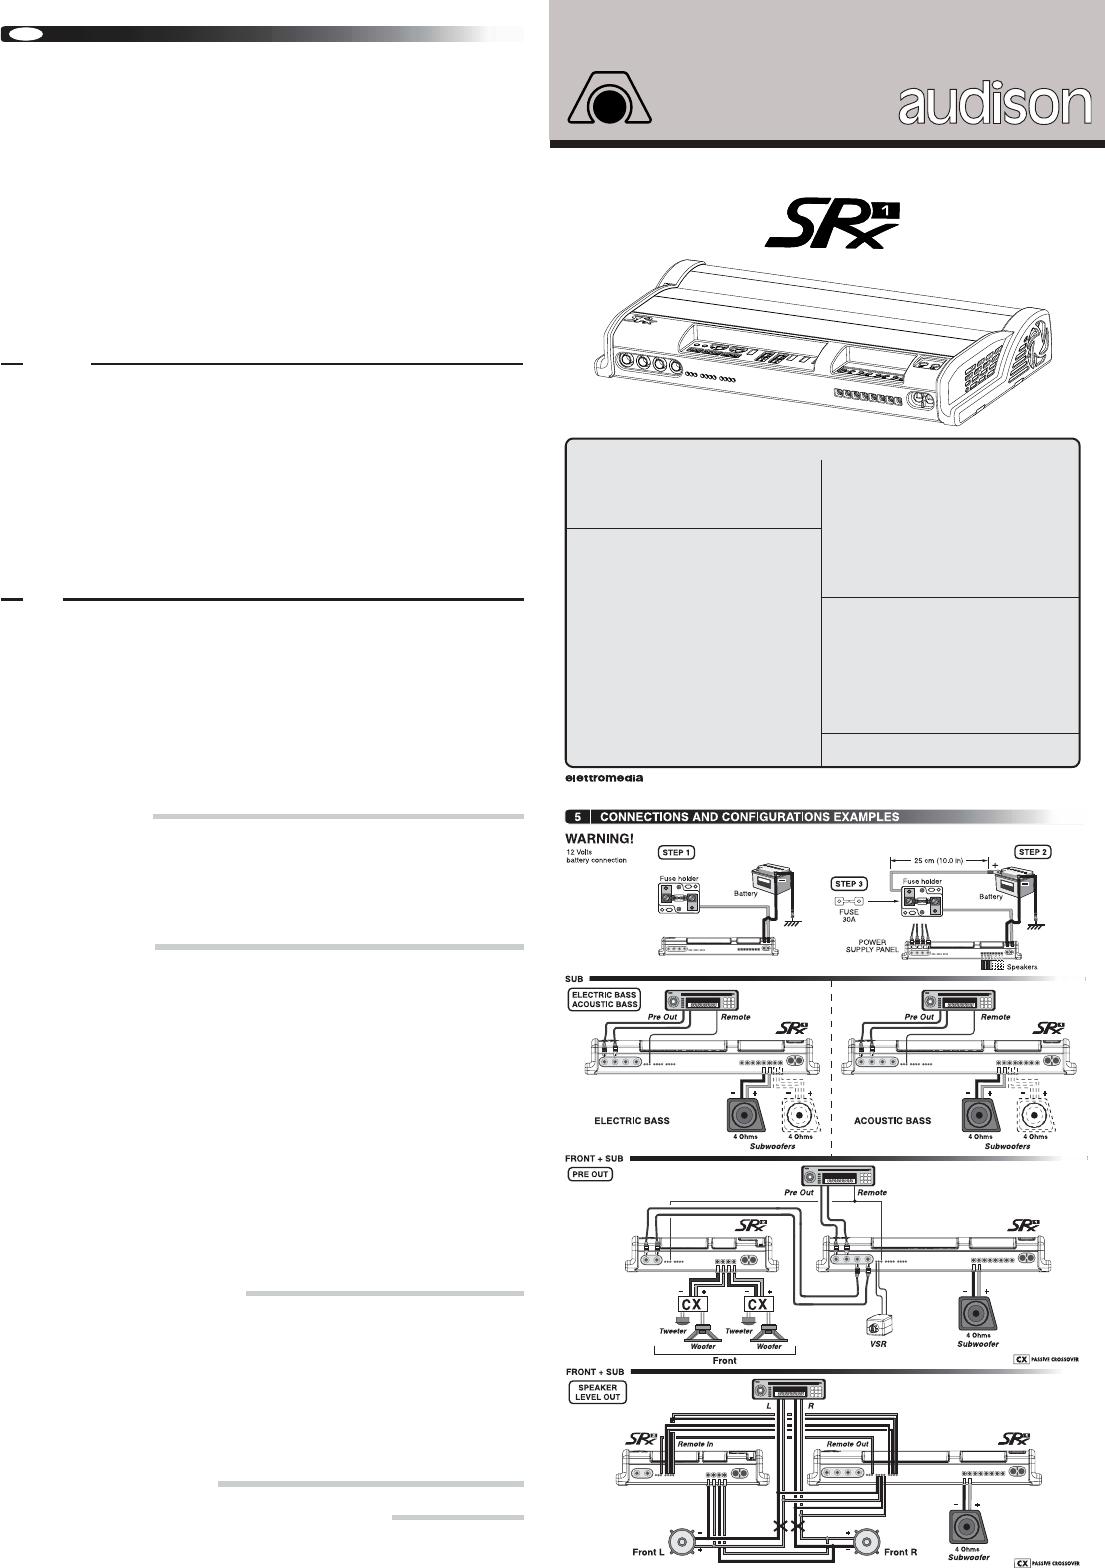 Audison srx 2s инструкция